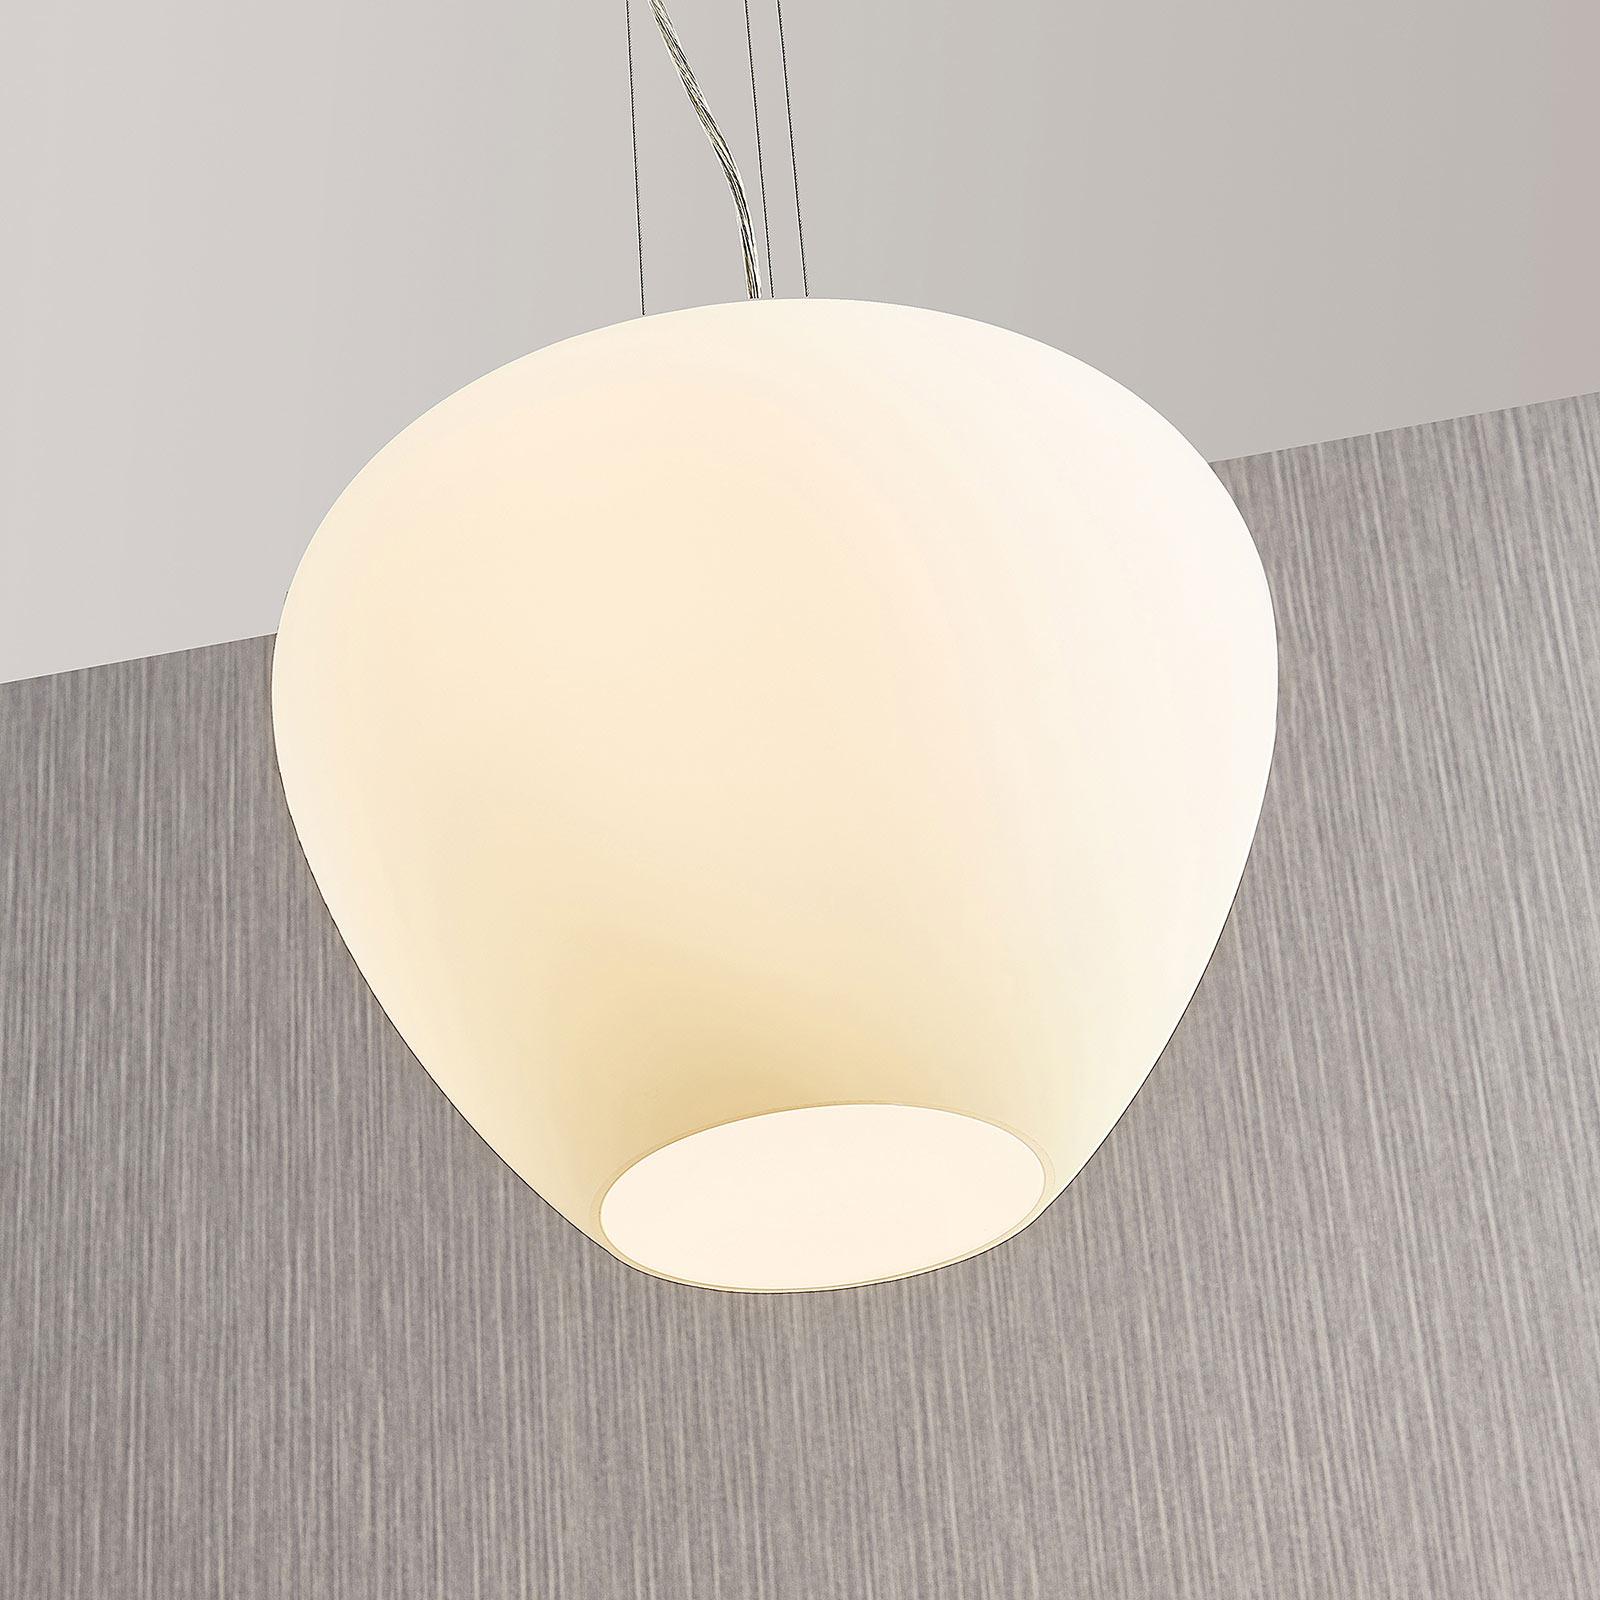 Glazen plafondlamp Bibiane, opaalwit